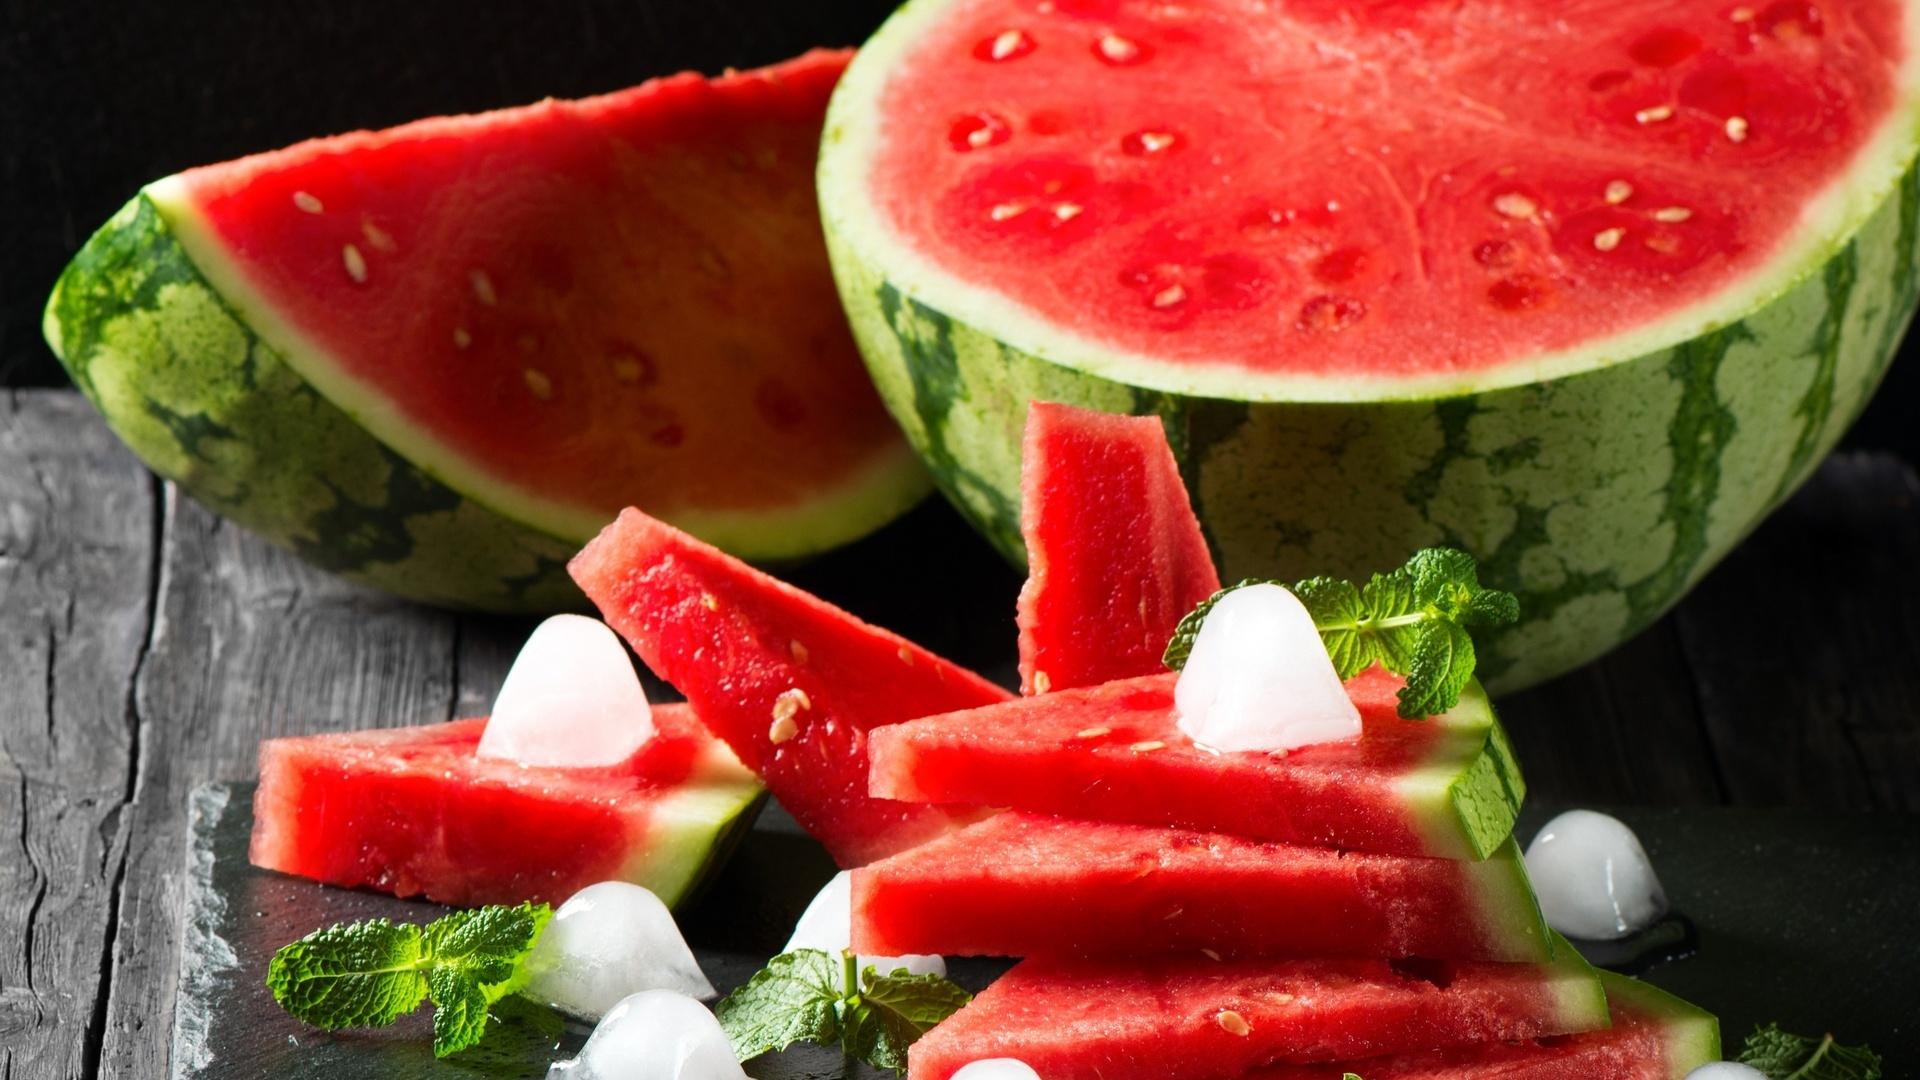 Watermelon Background Wallpaper HD